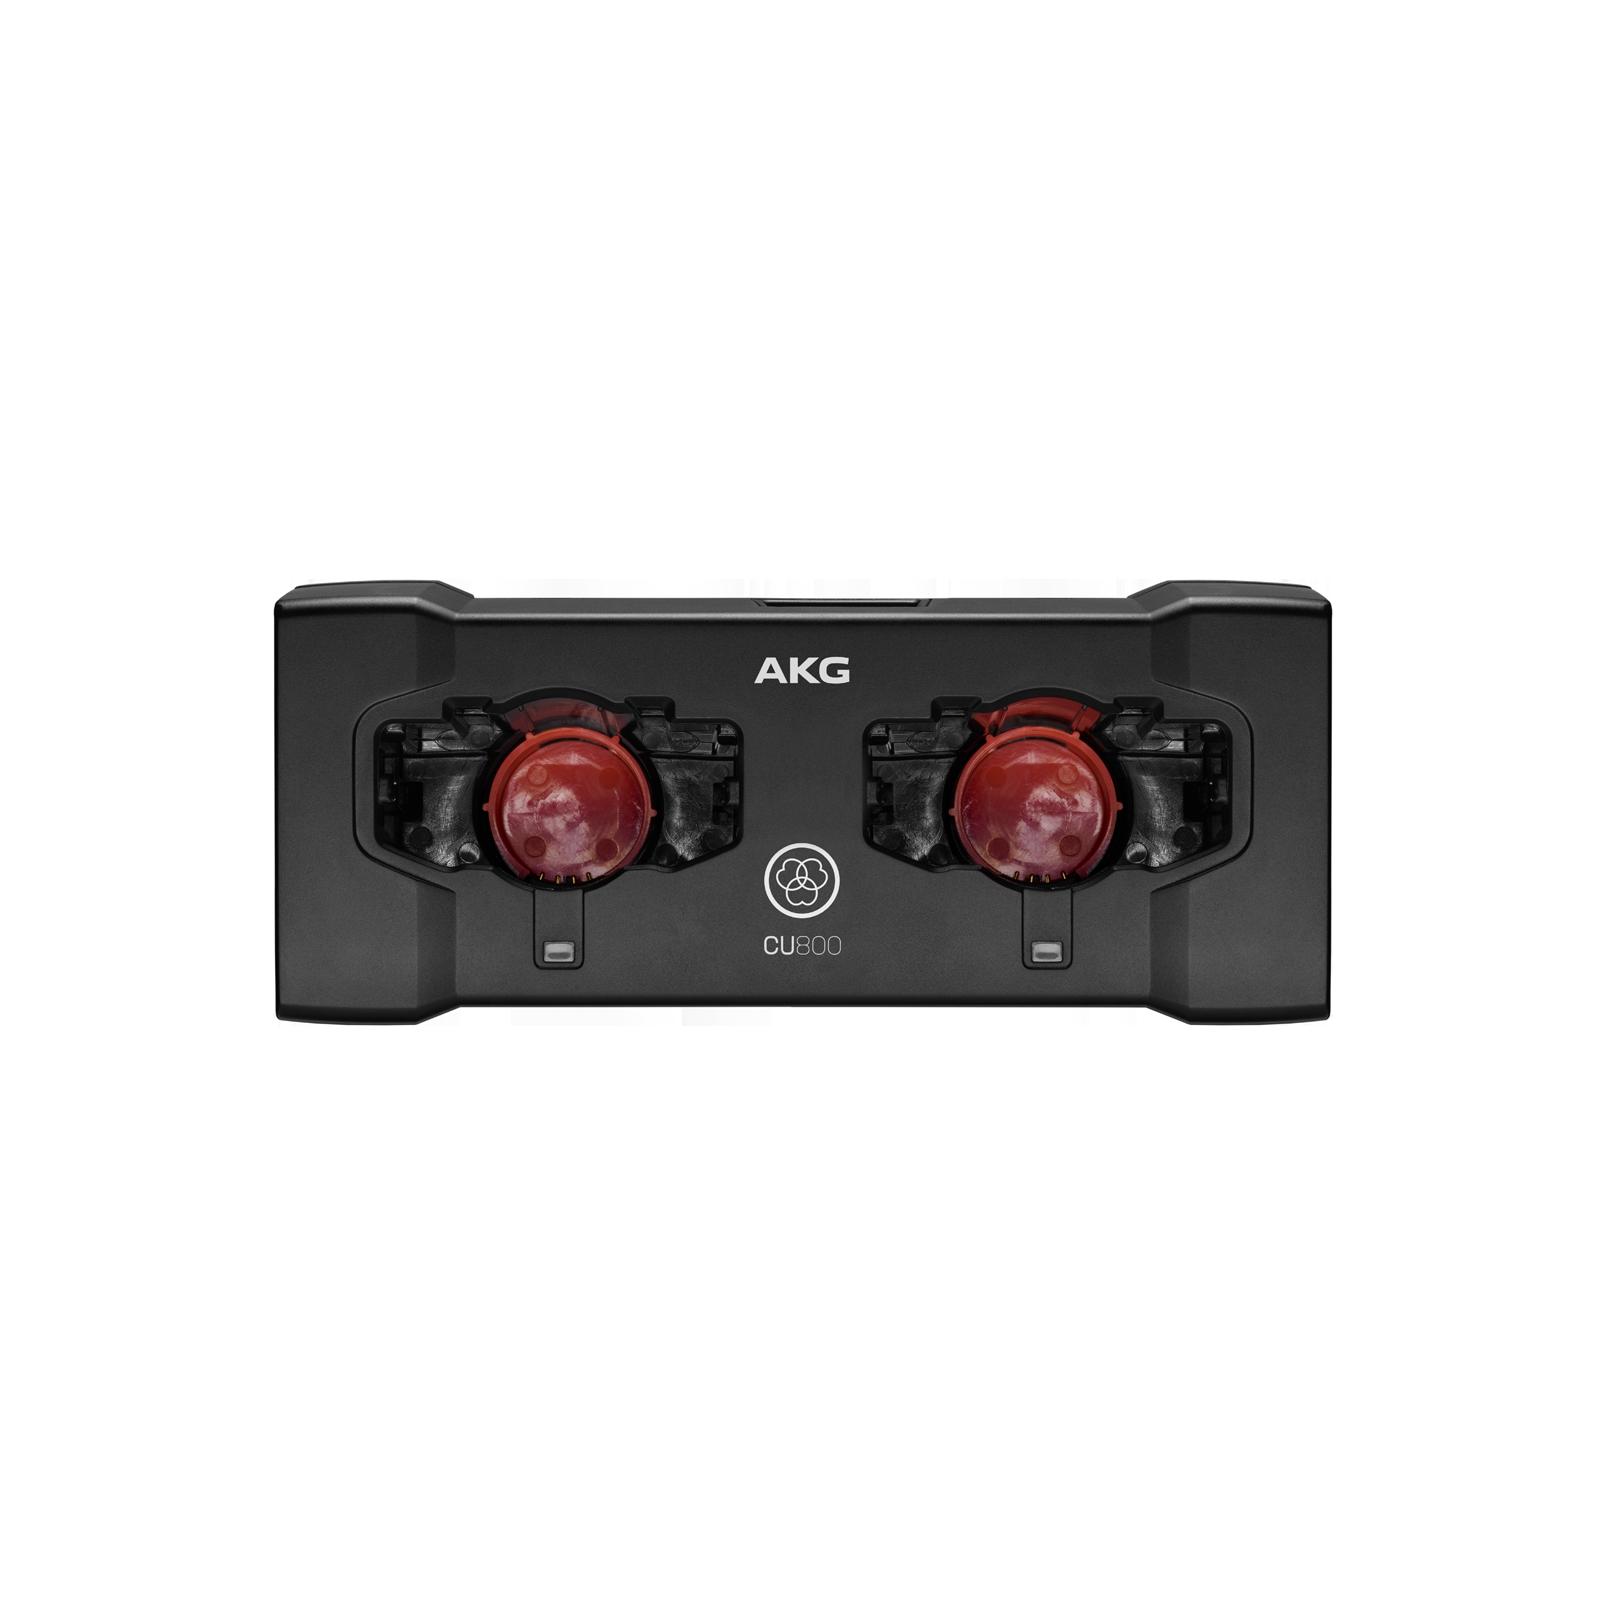 CU800 - Black - Charging unit for DHT800 and DPT800 transmitters - Detailshot 3